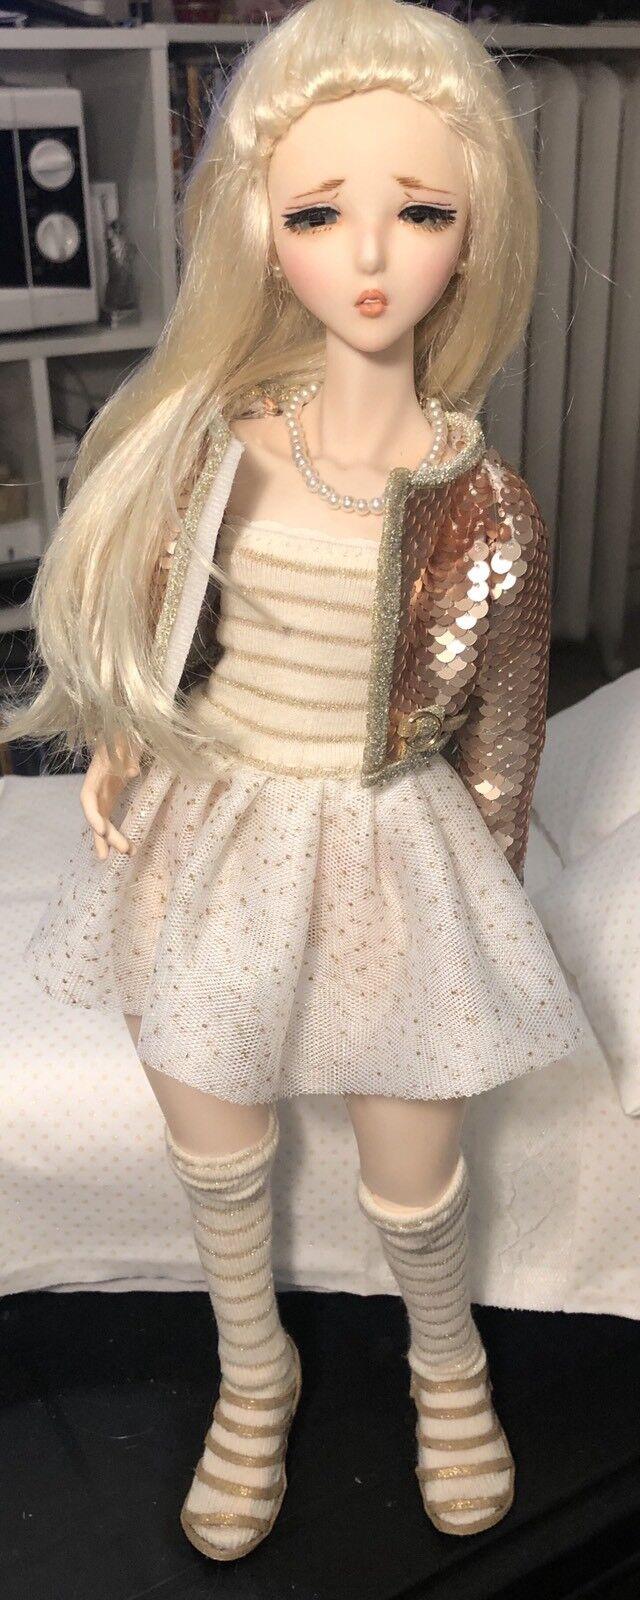 Vetement Outfit Dollfie Dream S Mdd Bjd 1/4 Msd Angel Philia